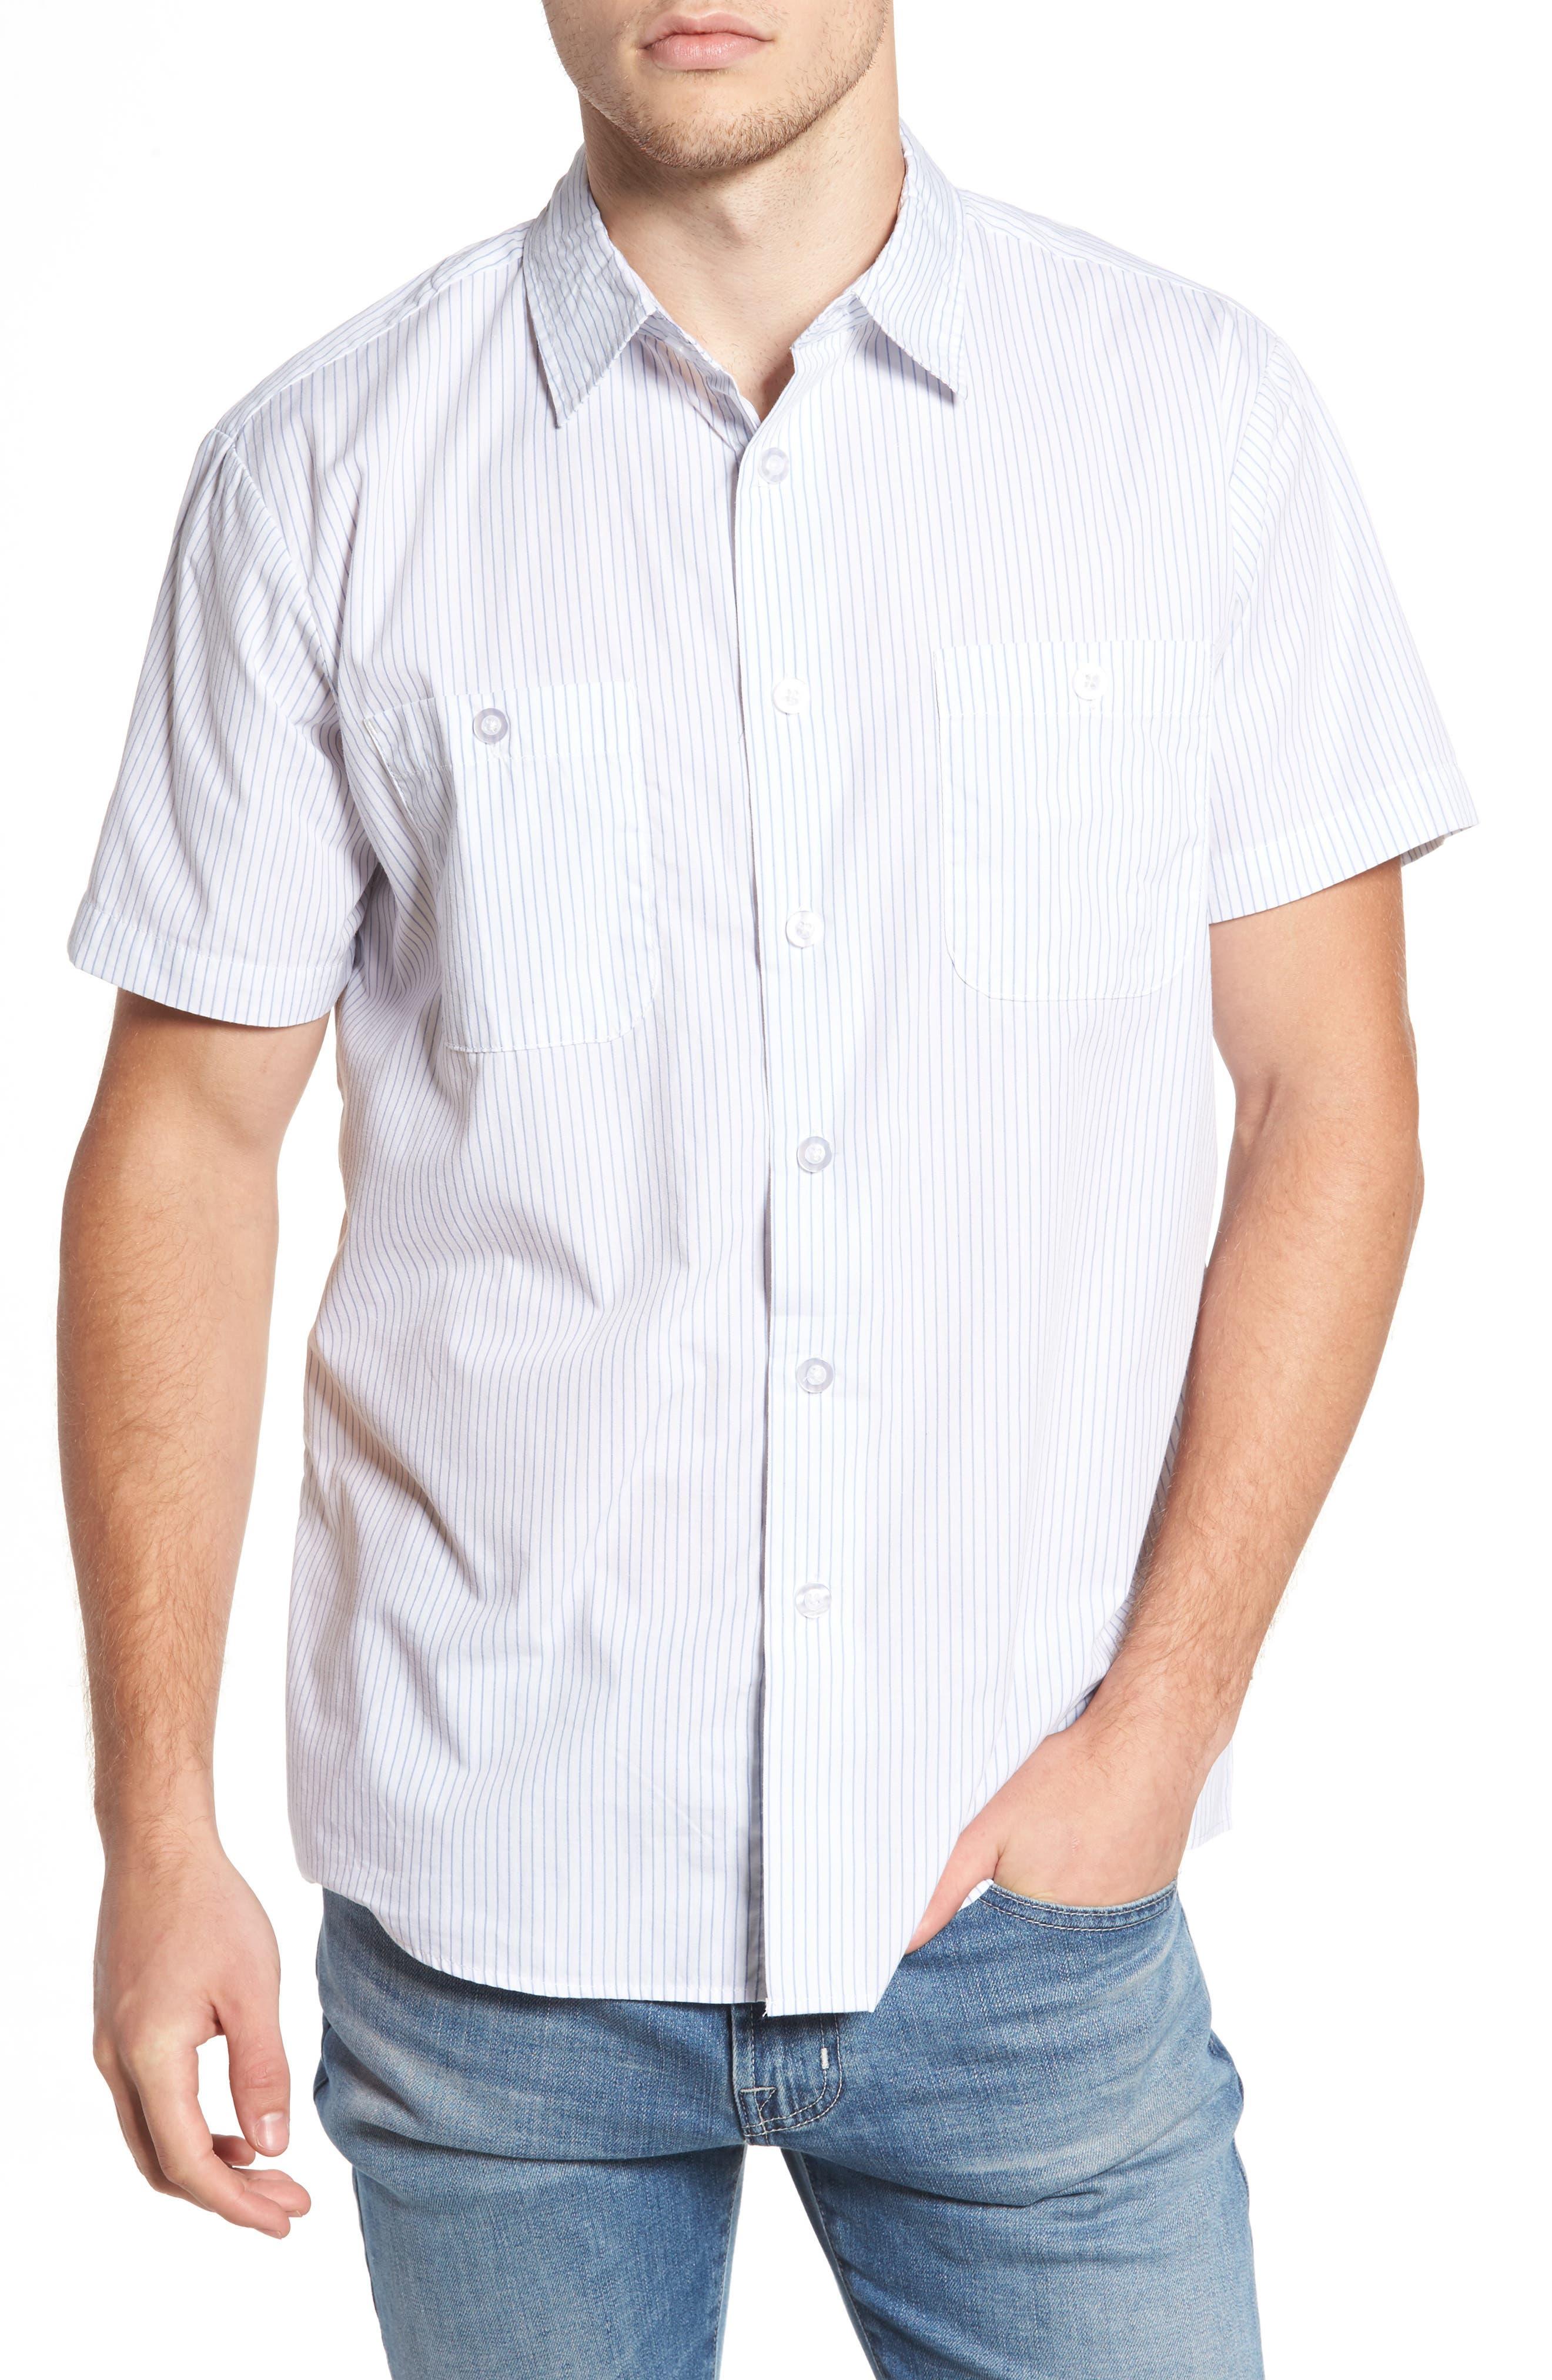 Main Image - Brixton Reeve Pinstripe Woven Shirt